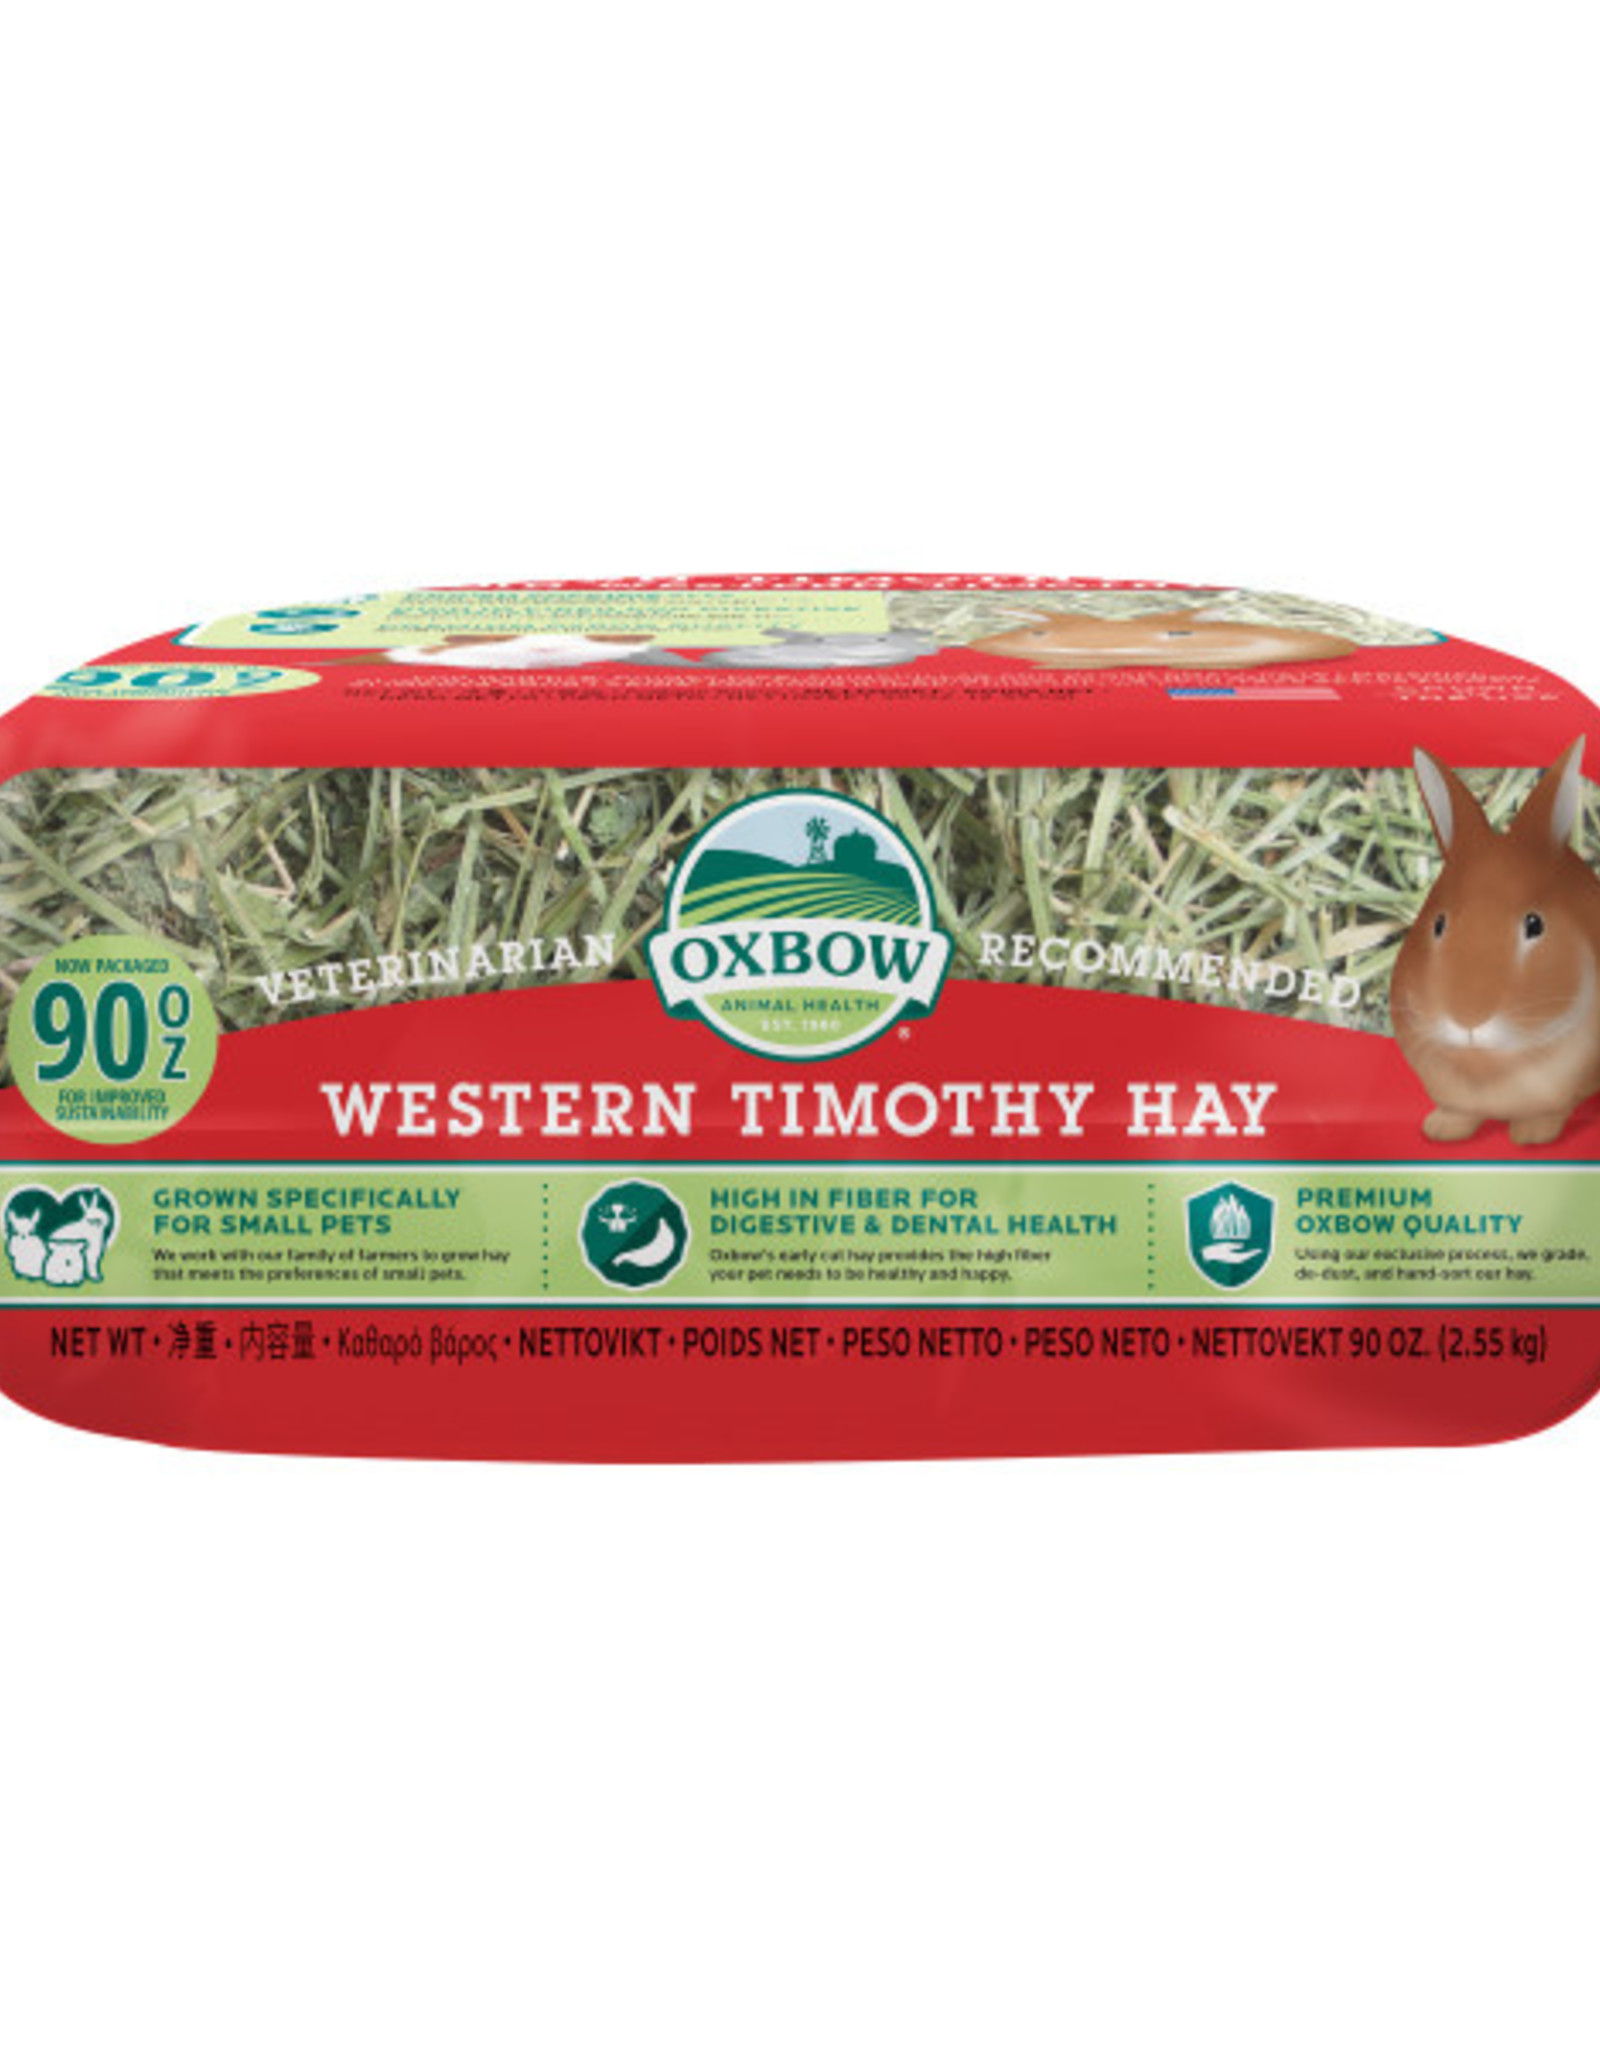 Oxbow Western Timothy Hay 90 Oz